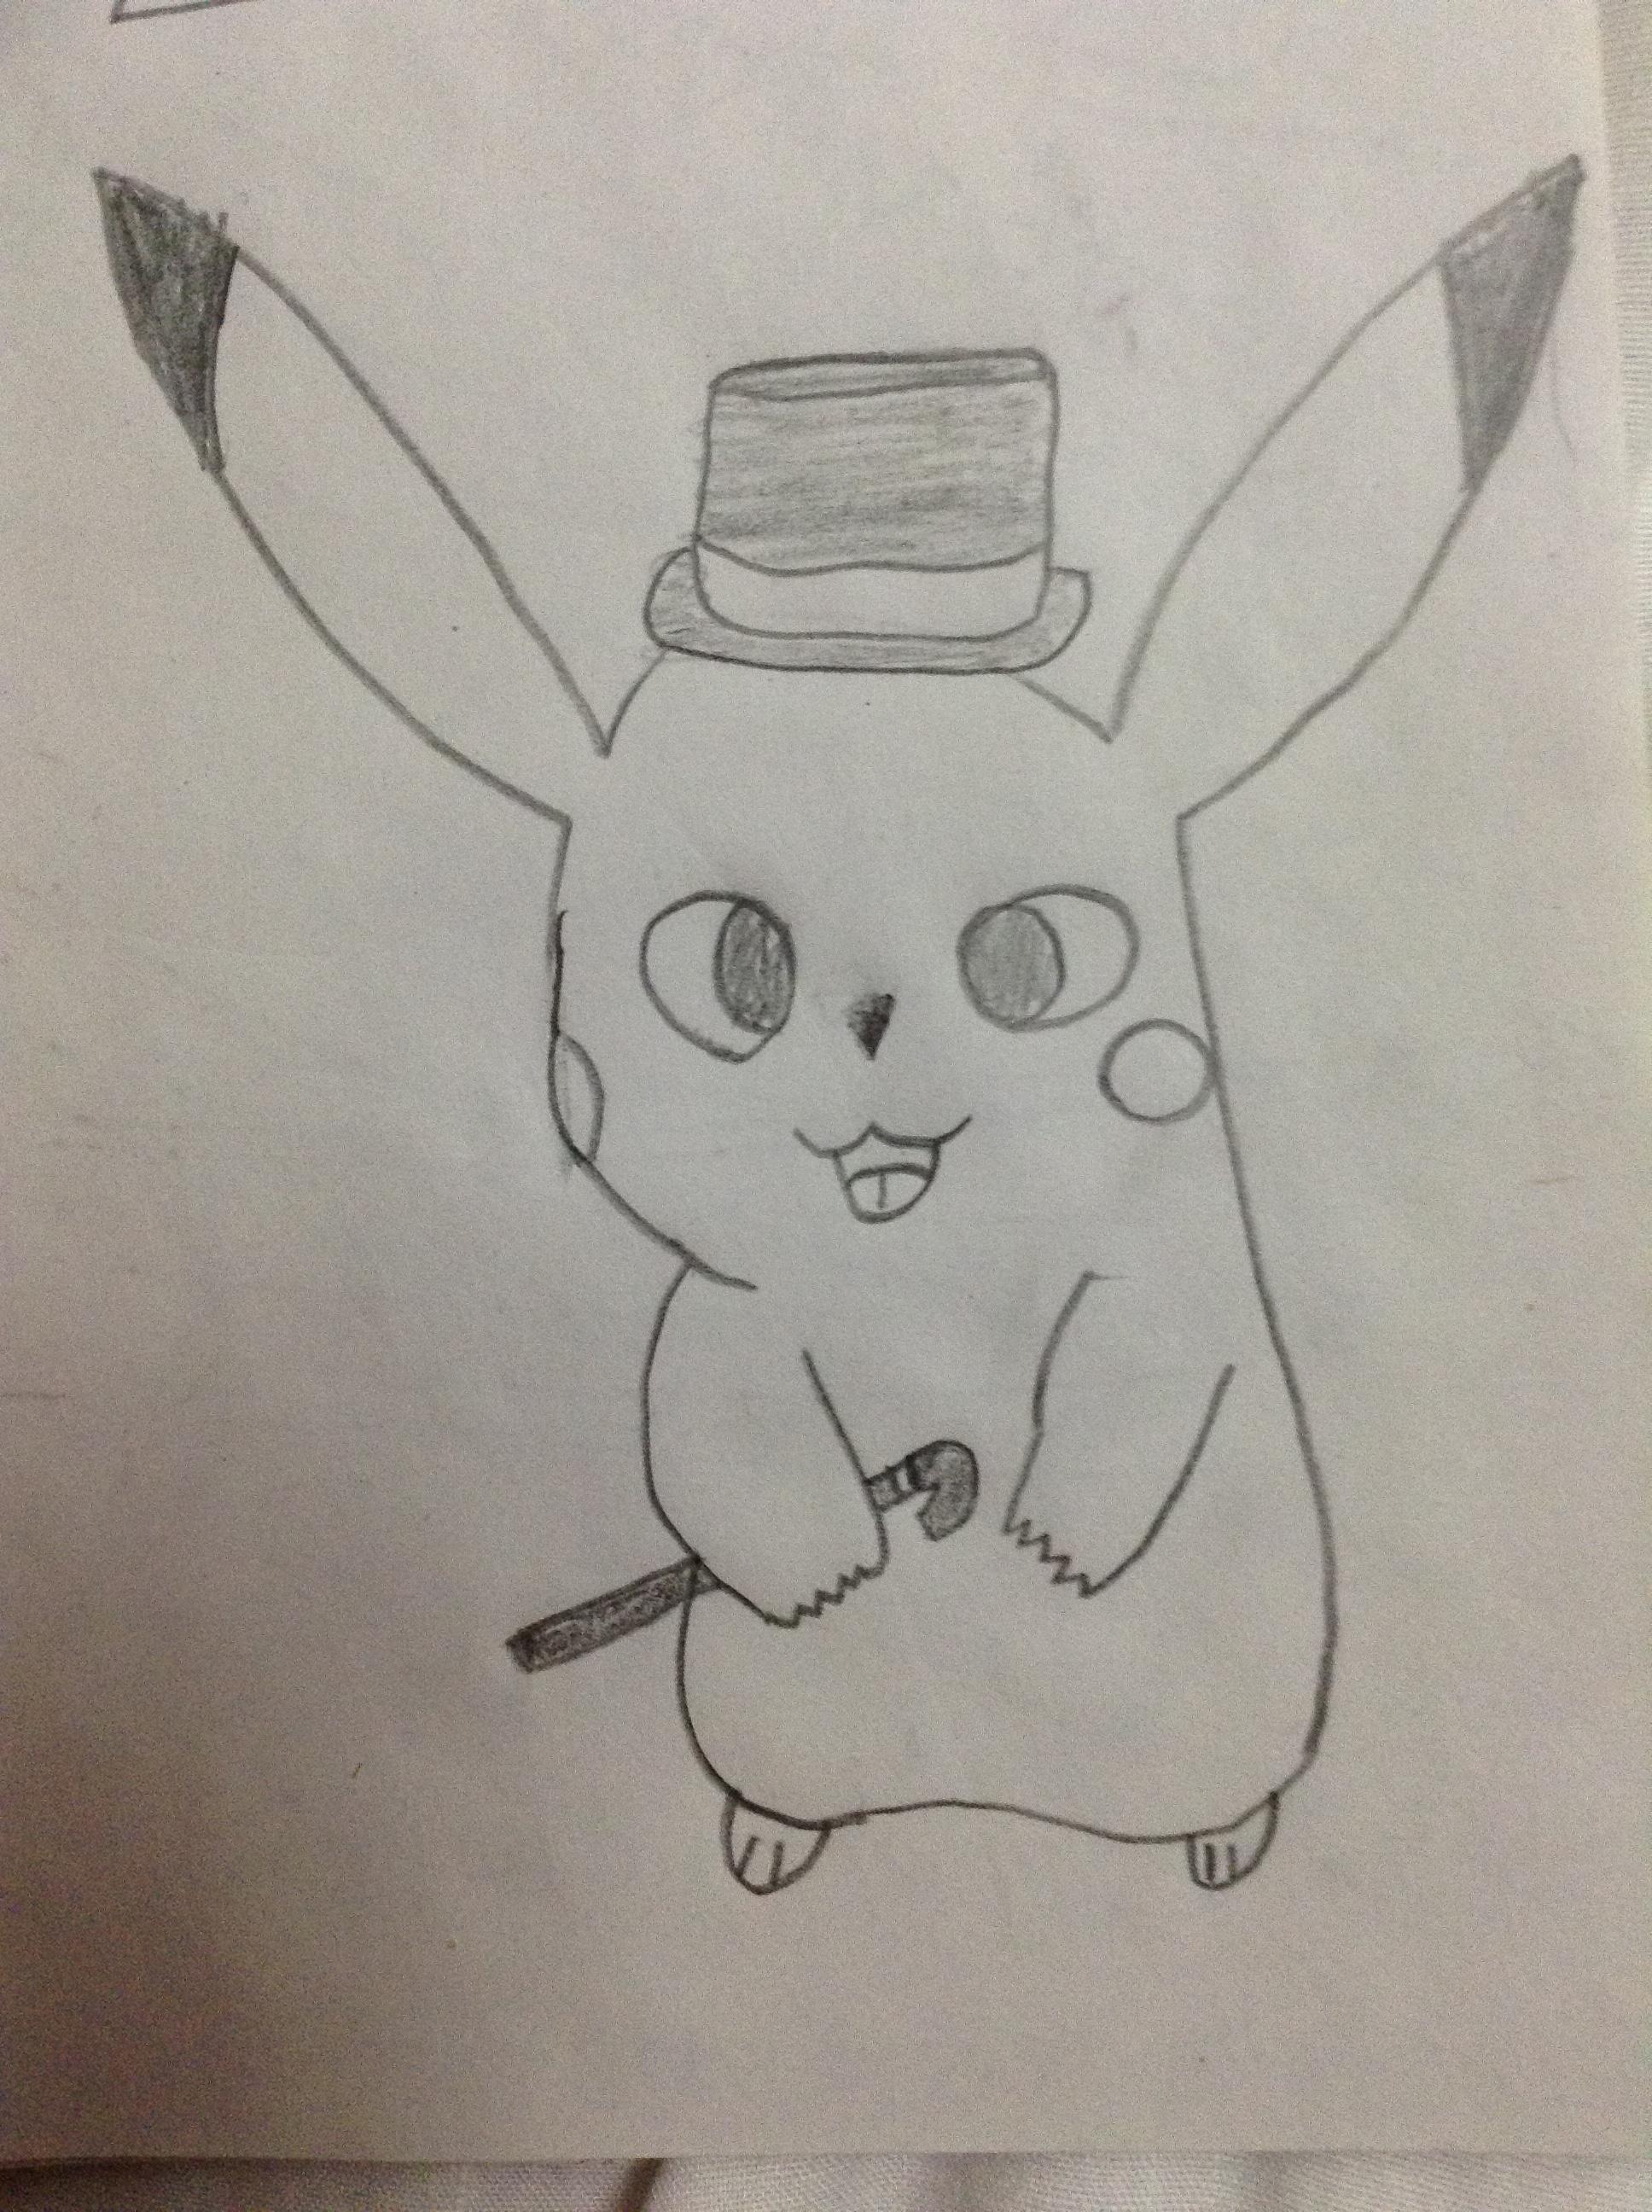 Posh Pikachu